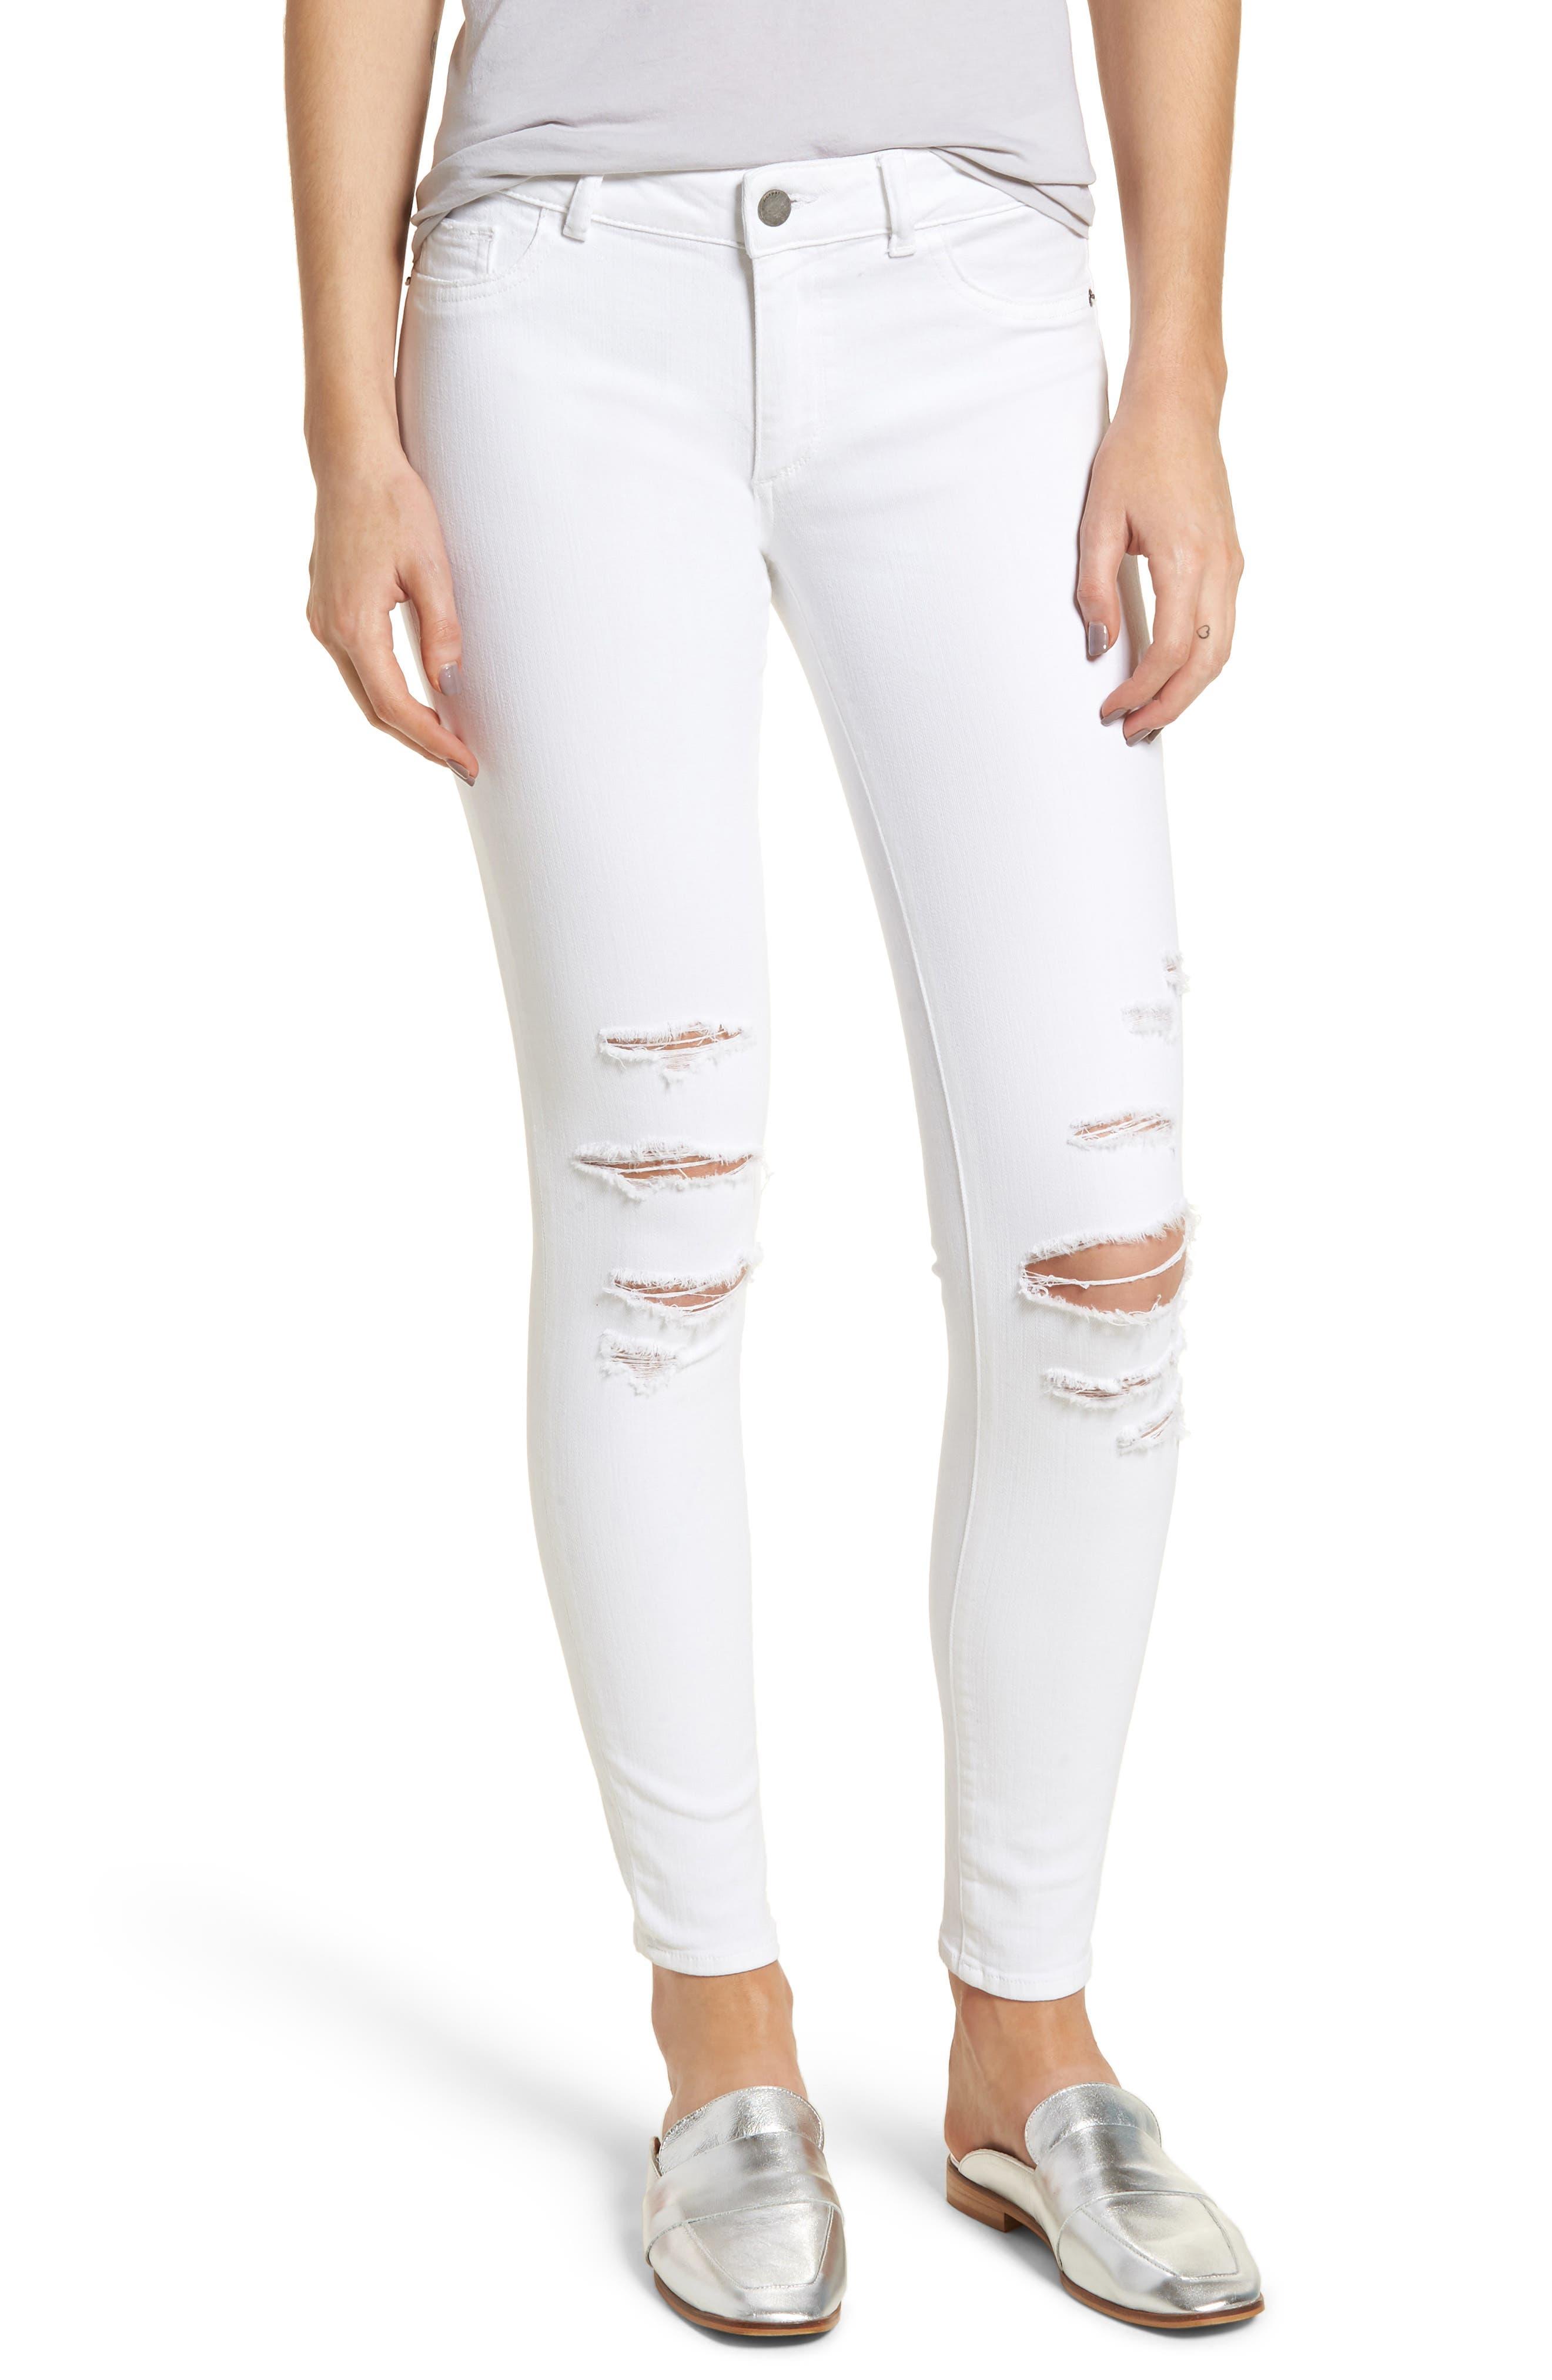 Emma Power Legging Jeans,                         Main,                         color, Dawson